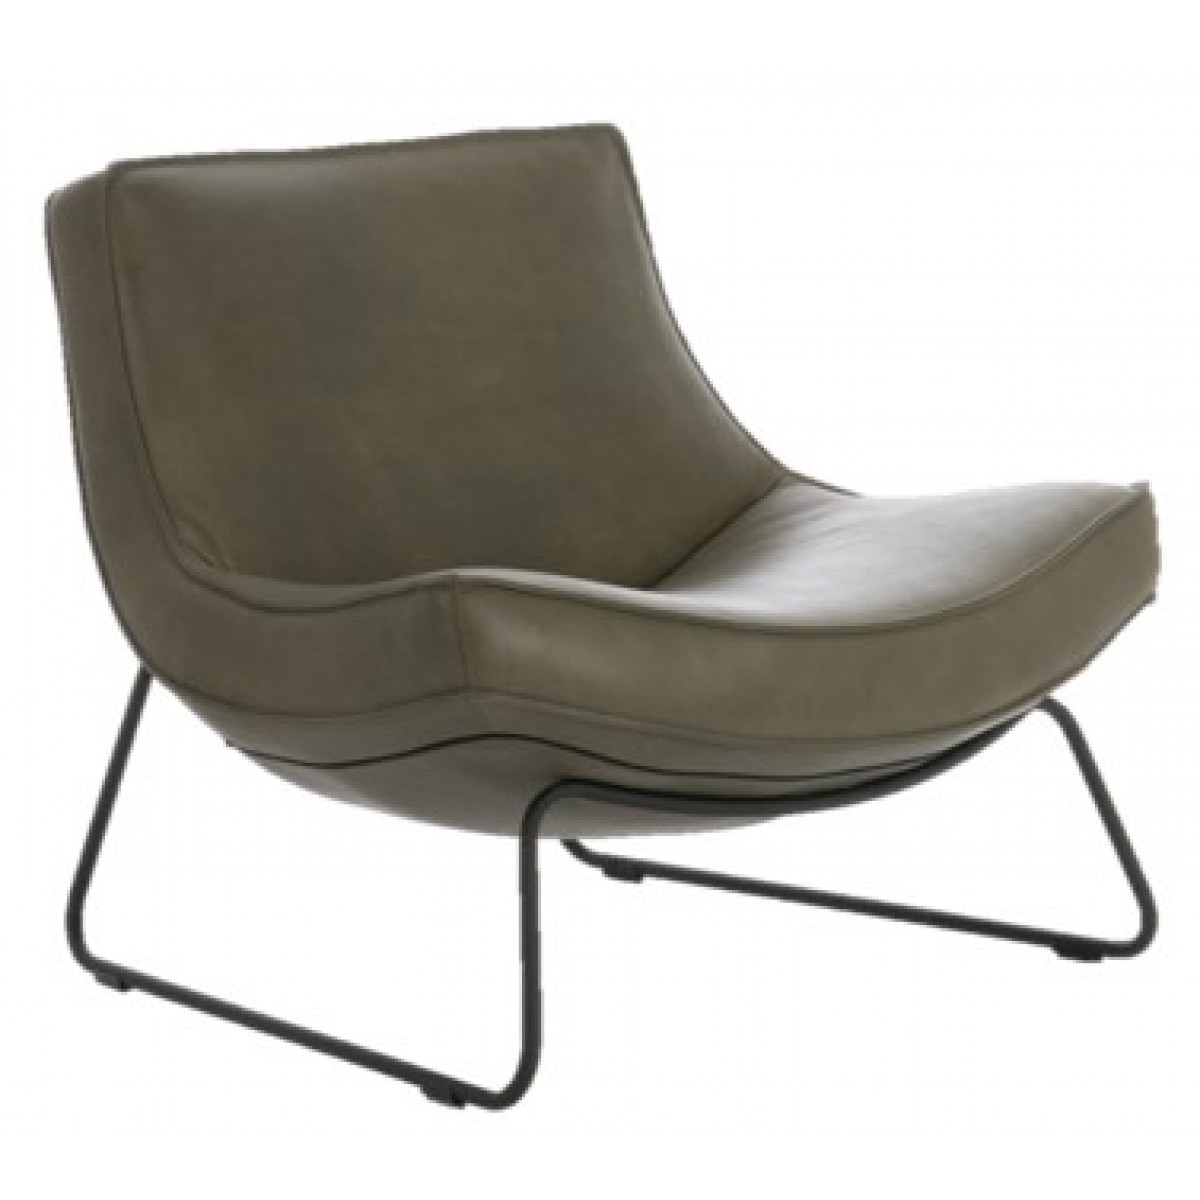 Uwa fauteuil sledeframe | I Live Design